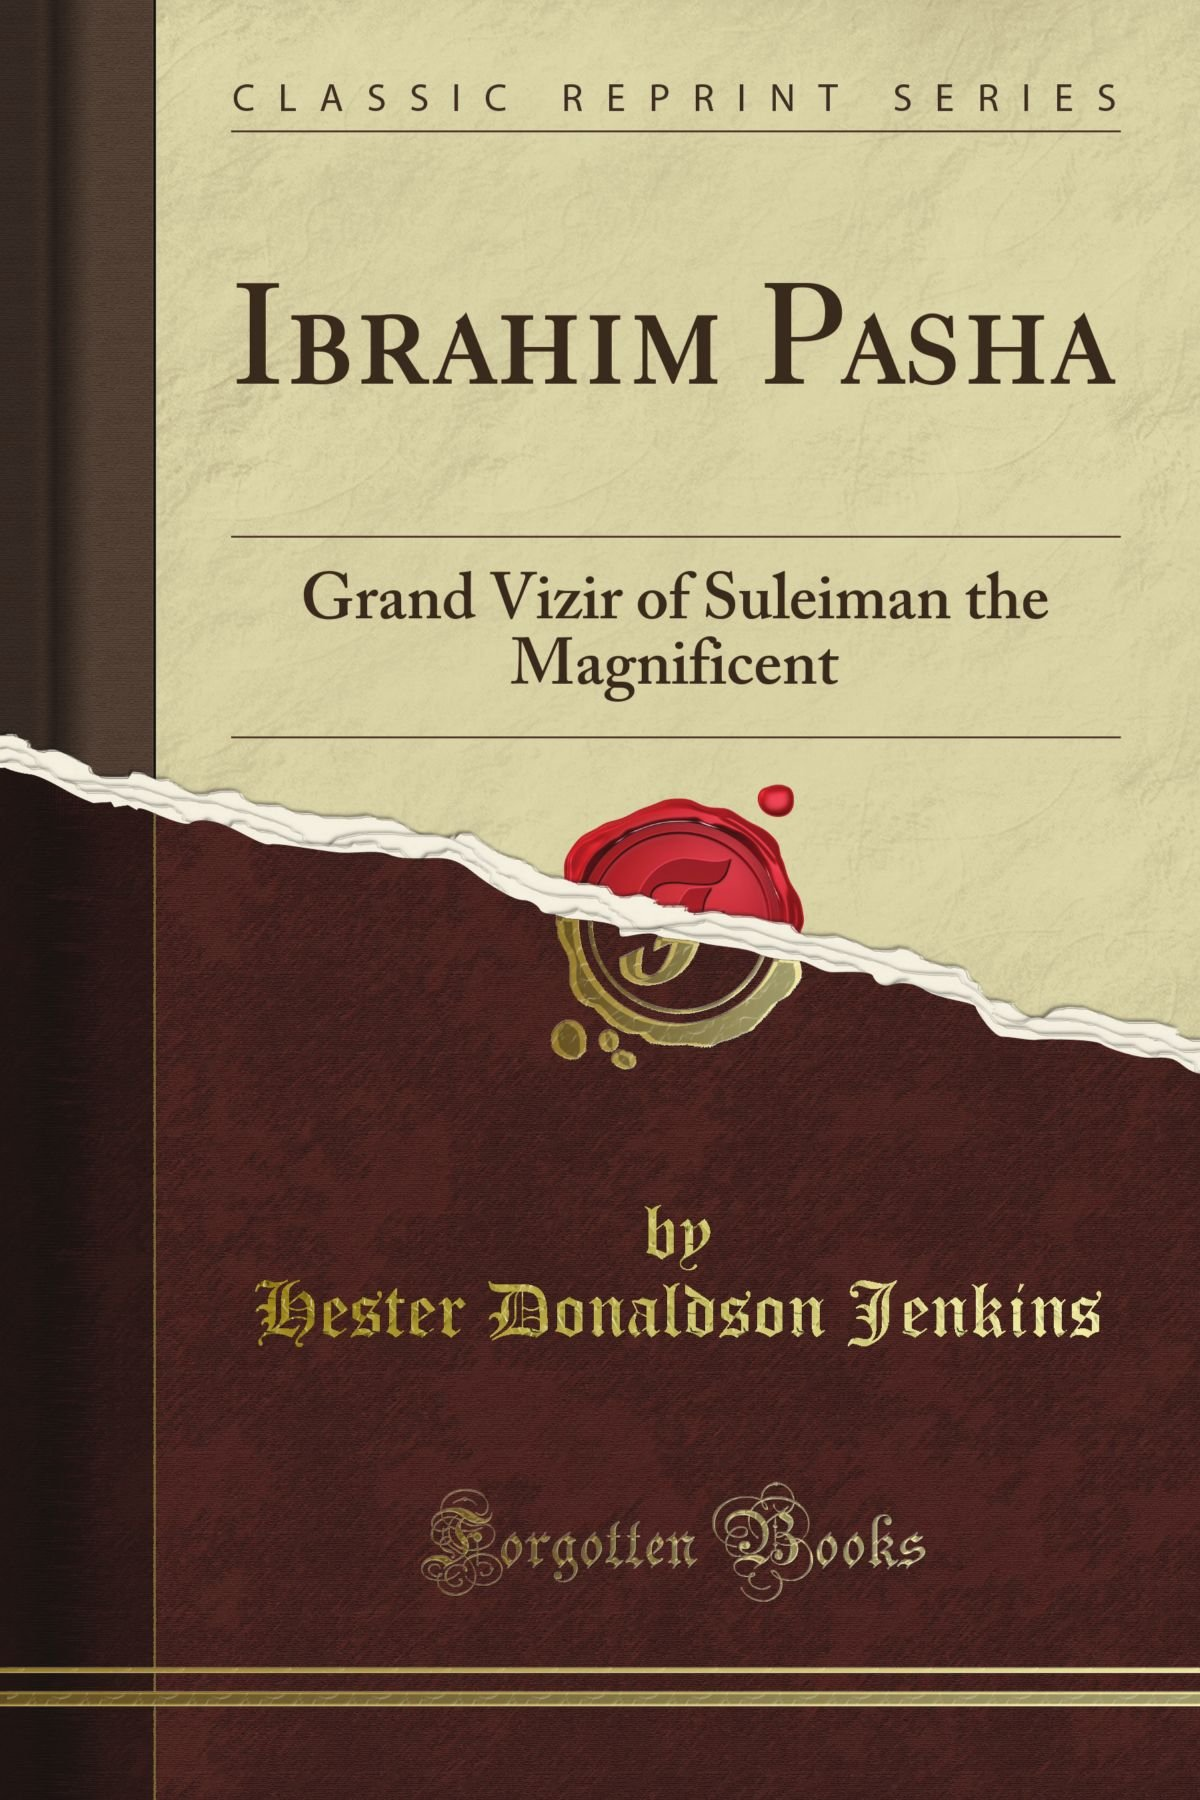 Ibrahim Pasha: Grand Vizir of Suleiman the Magnificent (Classic Reprint):  Amazon.co.uk: Hester Donaldson Jenkins: Books